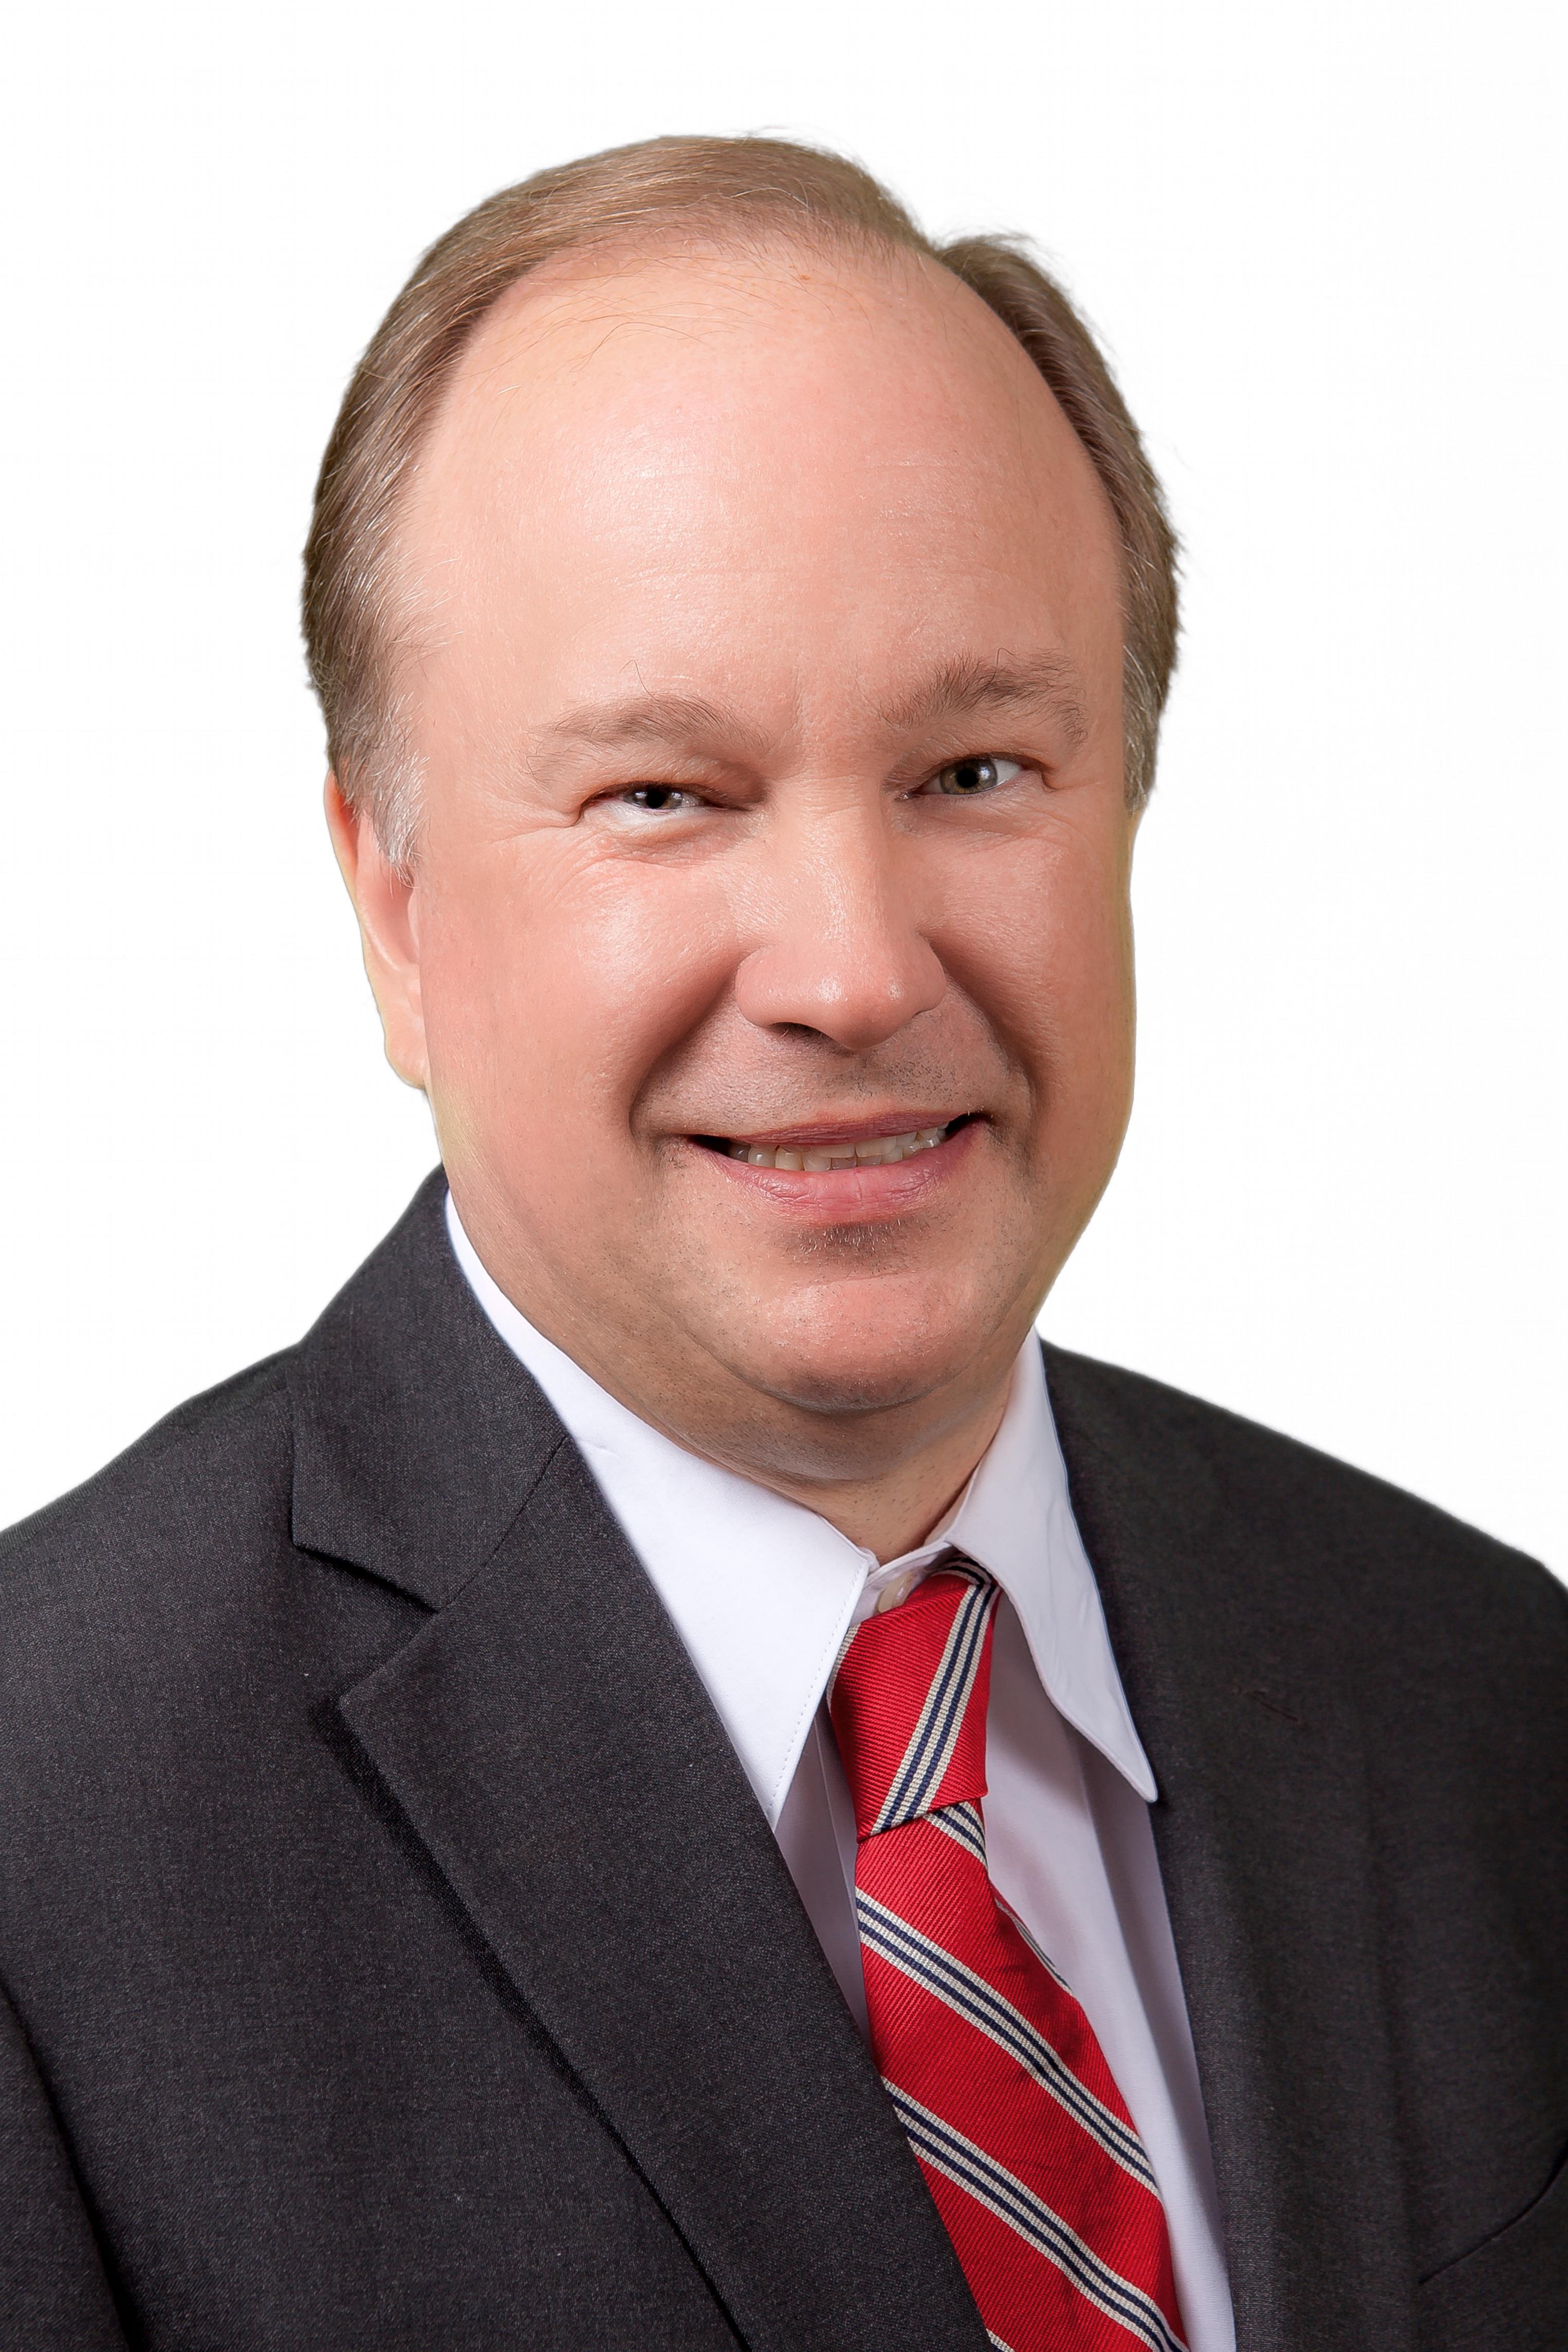 Robert K. Hurford, MD, PhD